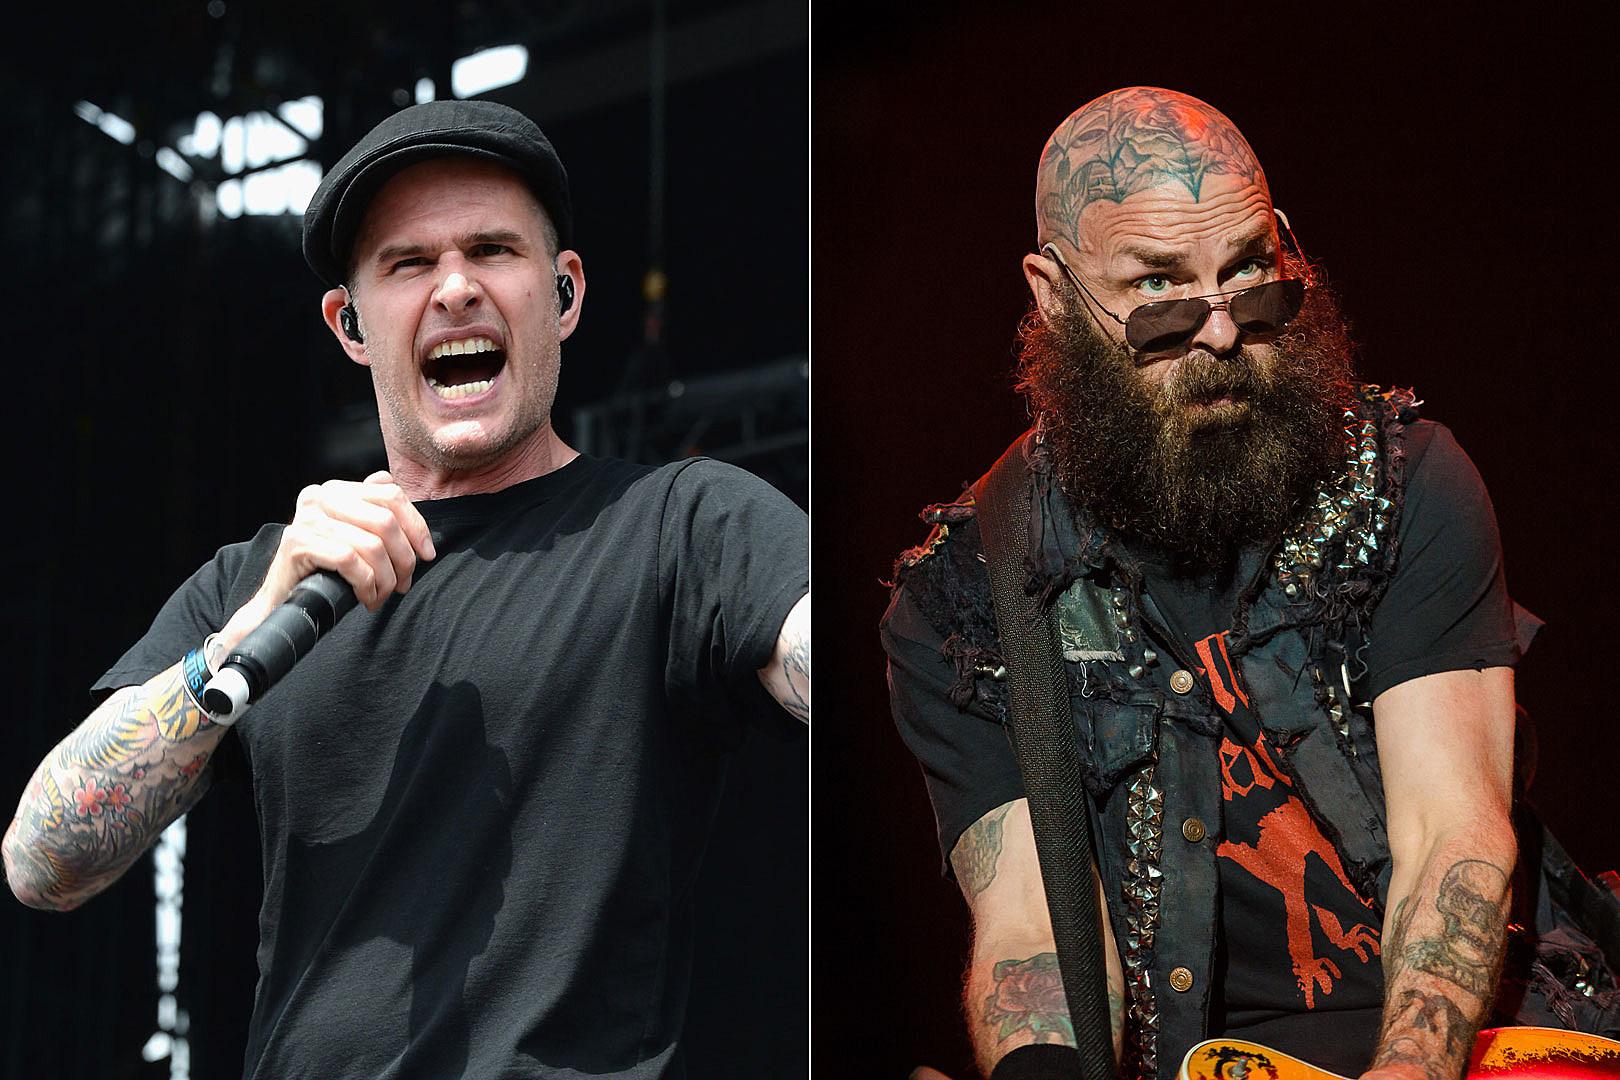 Dropkick Murphys + Rancid Announce 'From Boston to Berkeley II' Co-Headline Tour